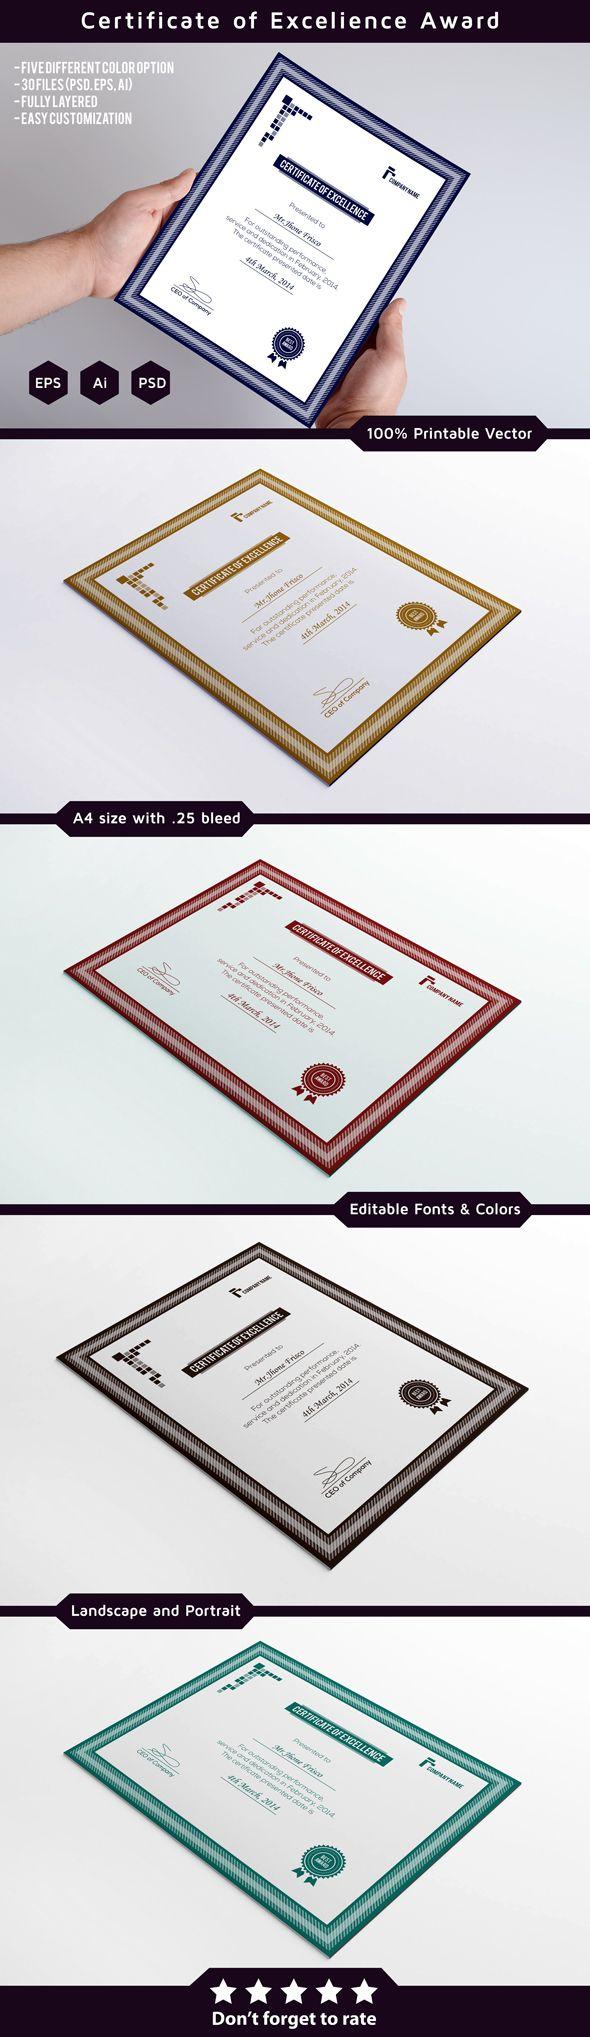 206 best certificate design images on pinterest certificate design award certificate template yelopaper Images